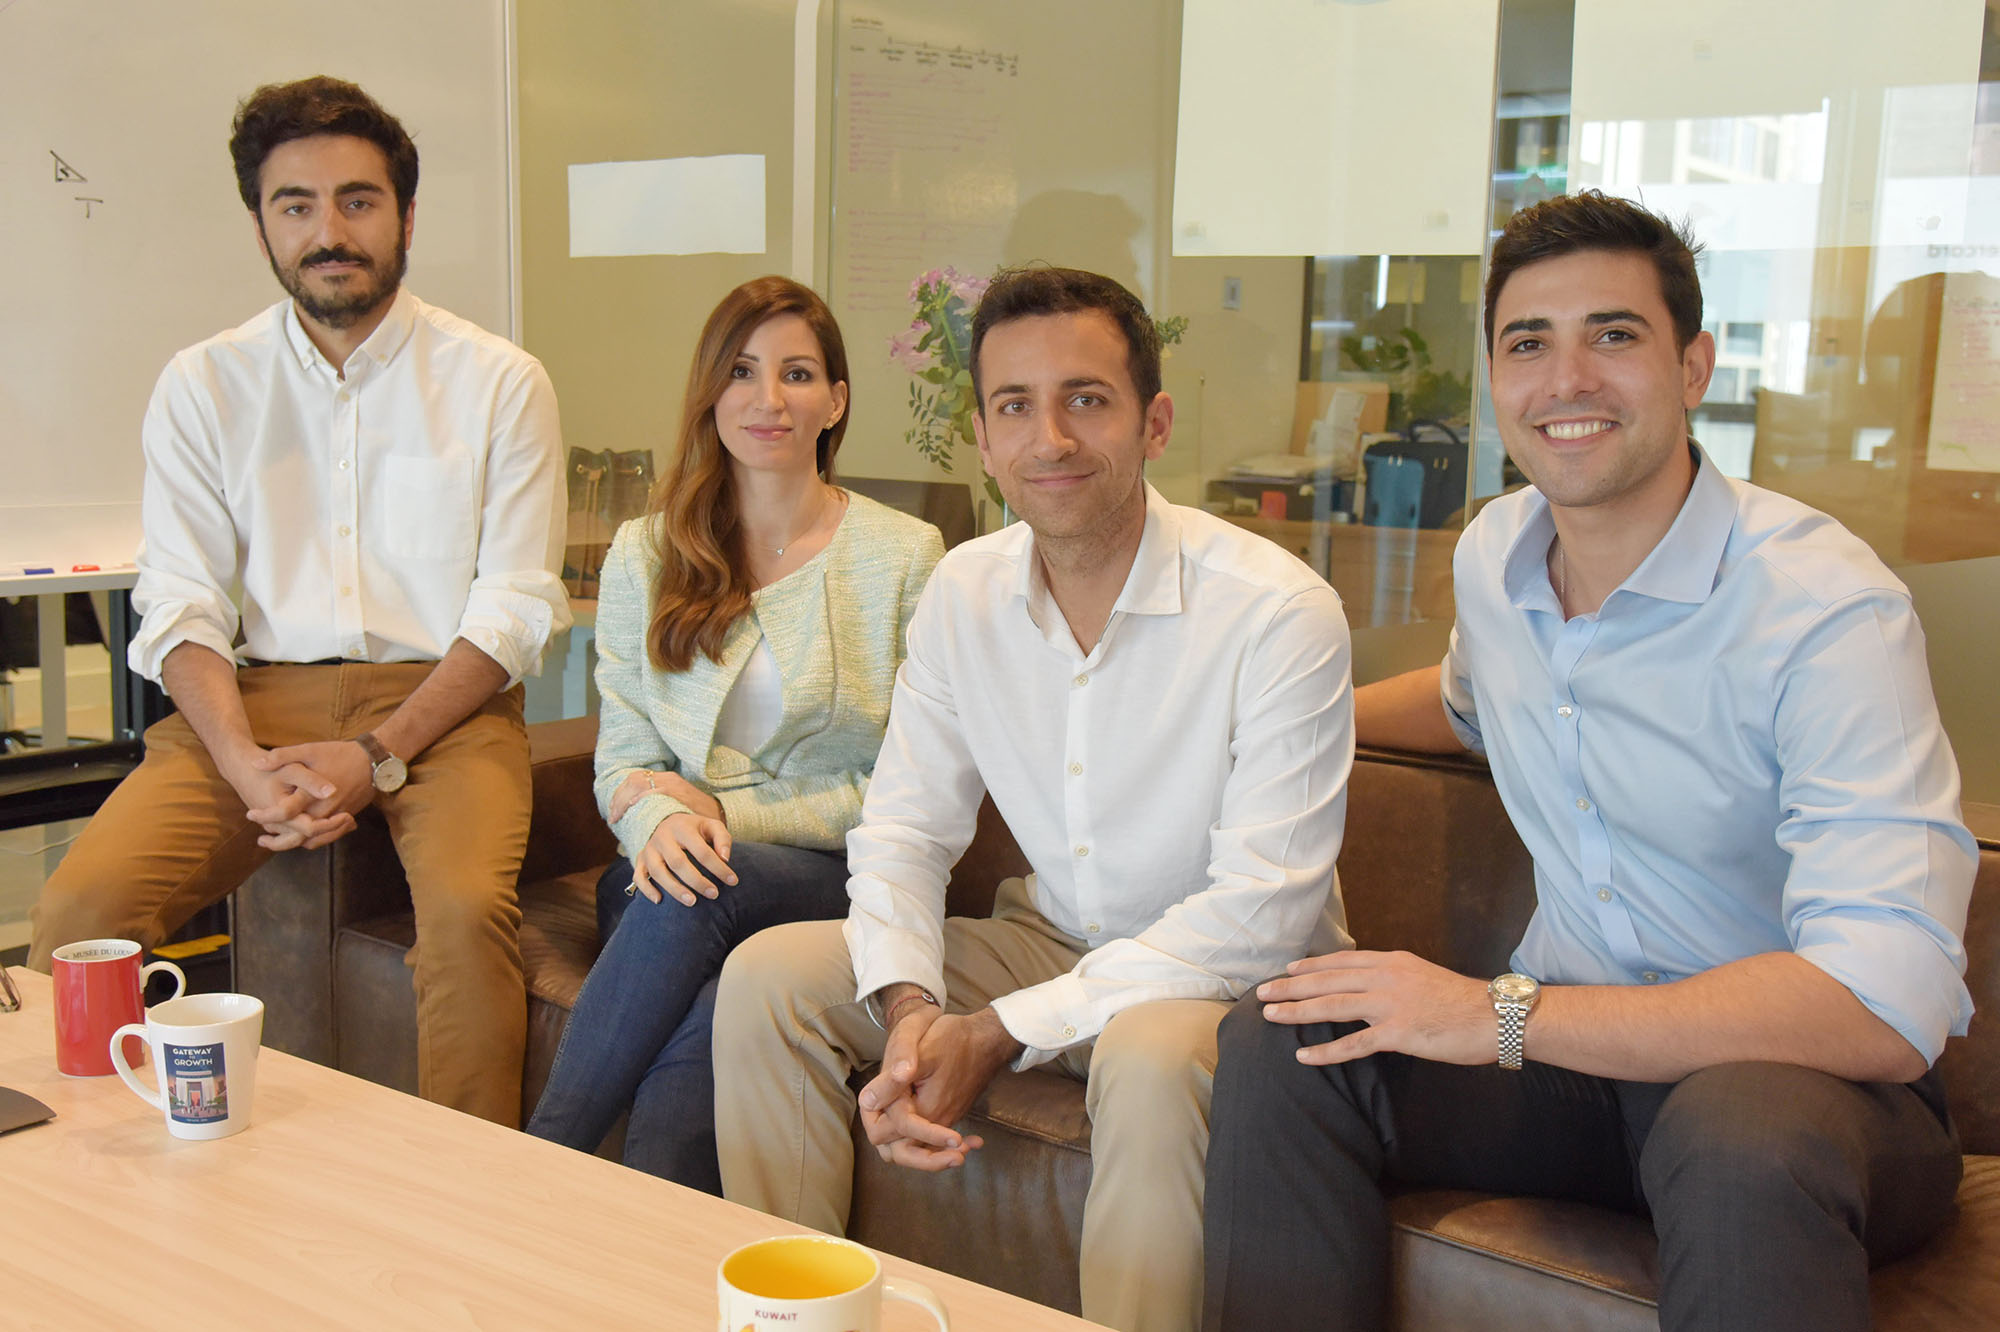 sawra online investment platform founders